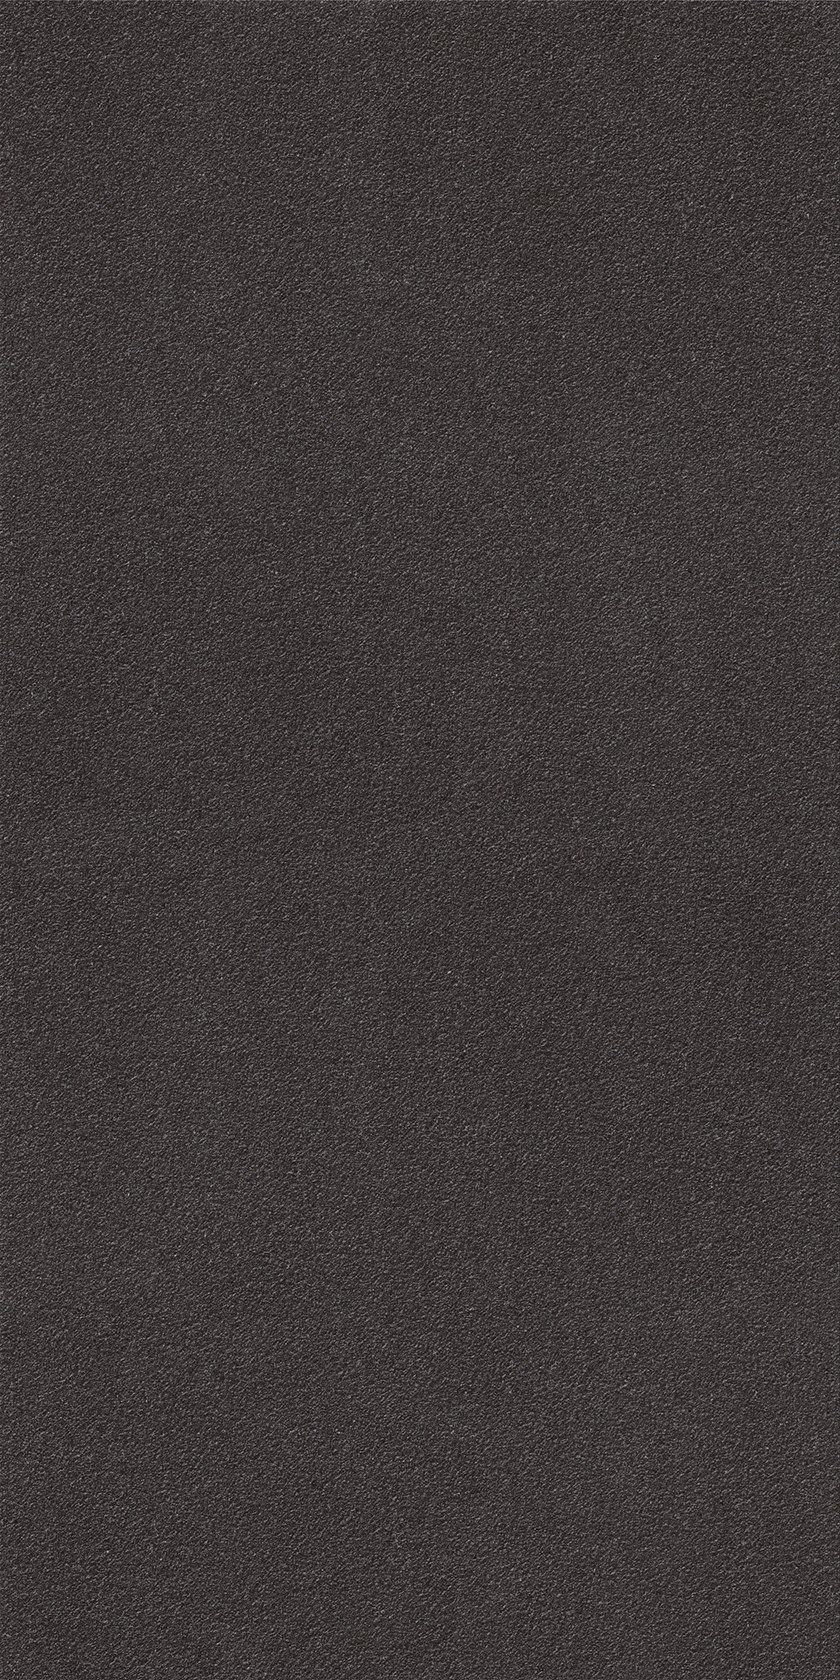 Bloom ITOP Negro Abujardado / Bush-hammered 150x320 cm